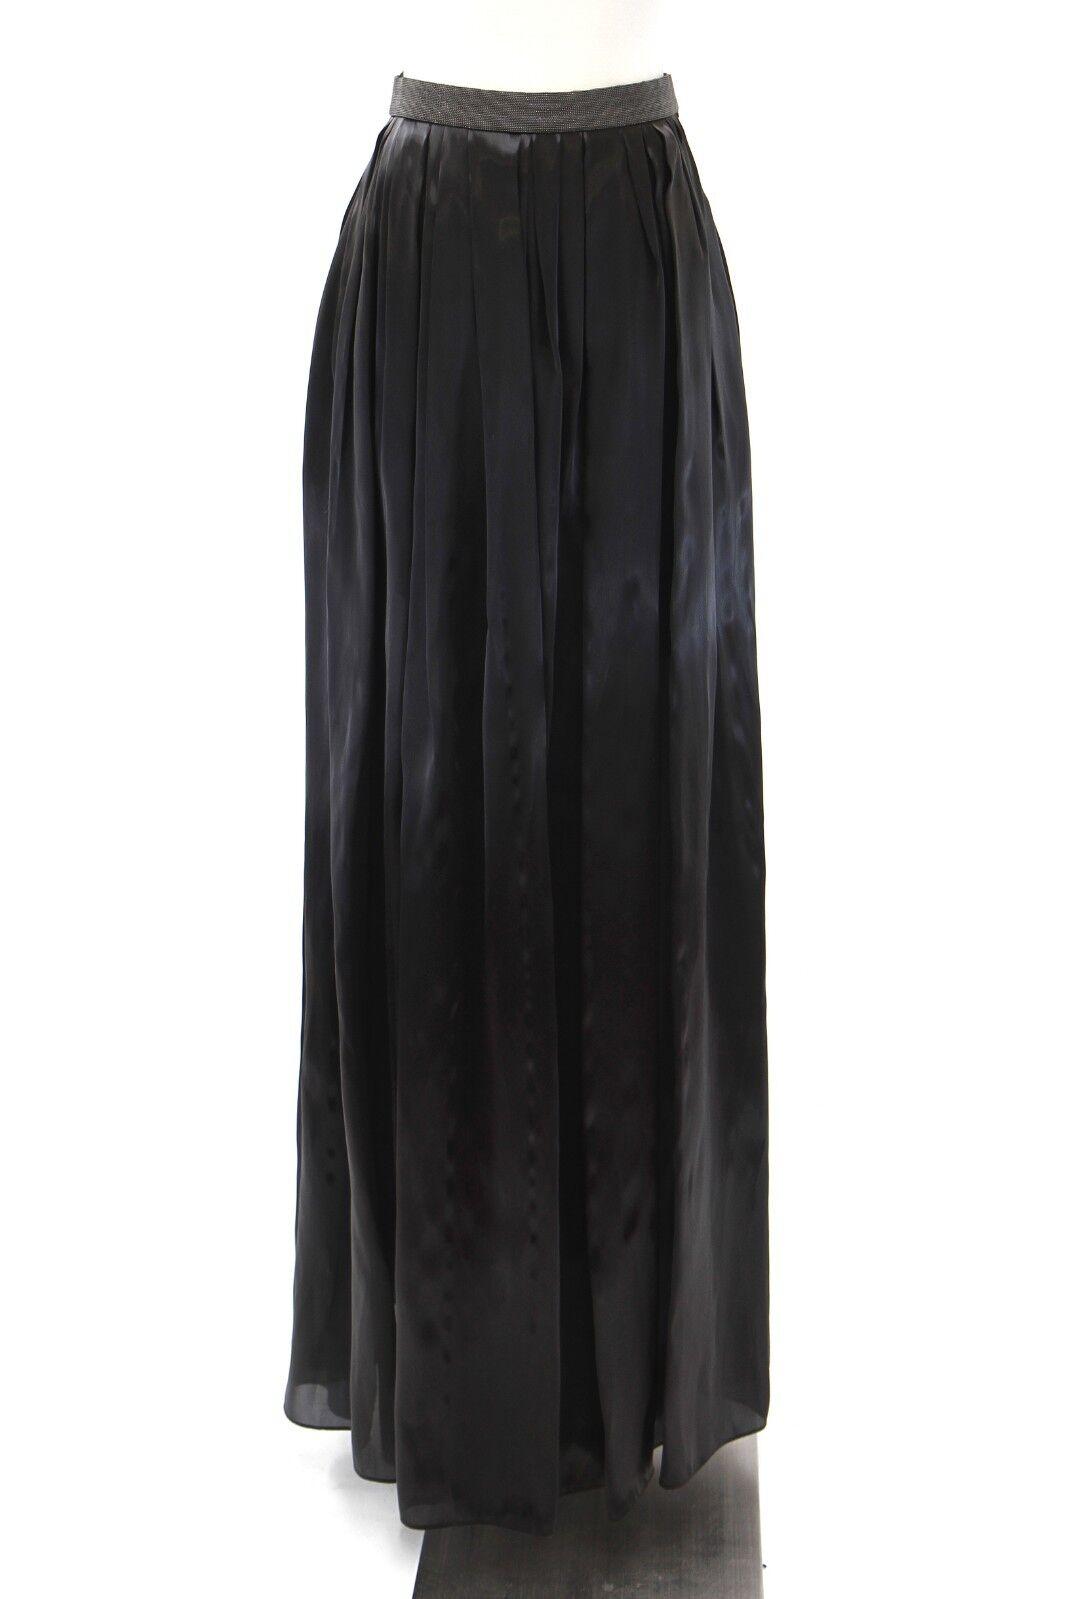 NWT 2345 Brunello Cucinelli Metallic Silk Monili Bead Ball Gown Skirt42 6US A181